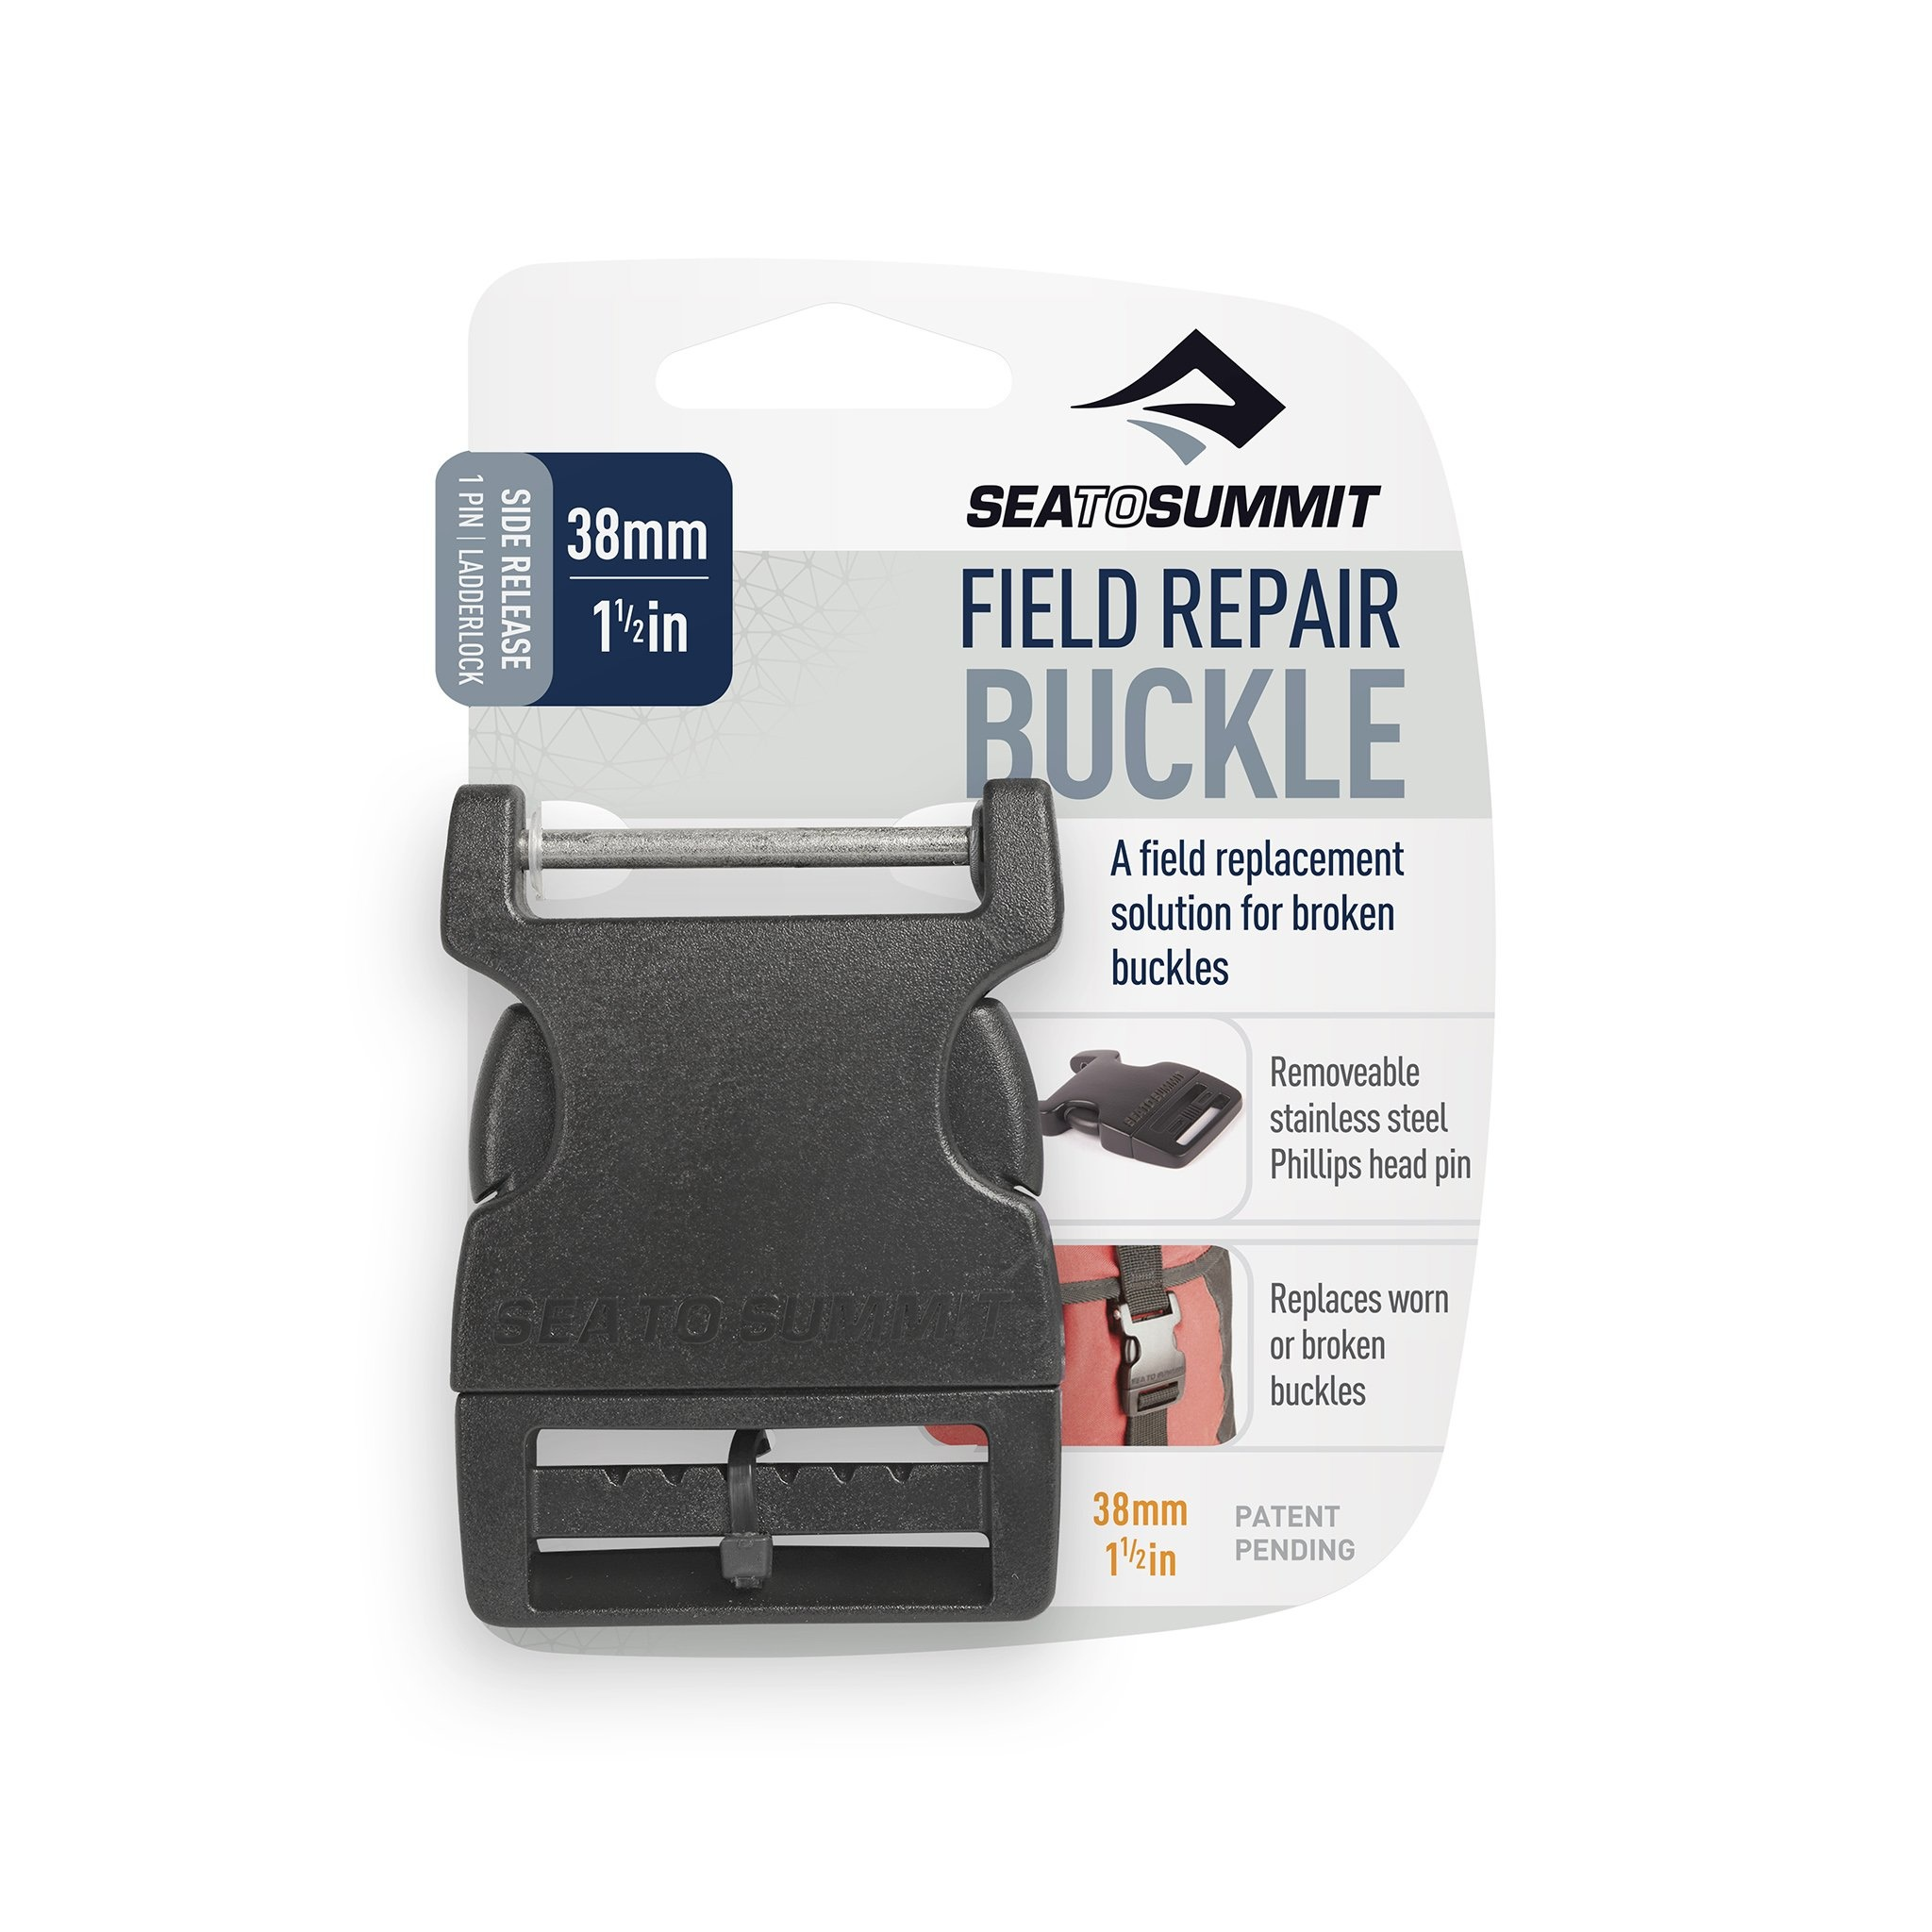 "Sea to Summit Field Repair Buckle 38mm / 1 1/2"" Side Release 1 Pin"